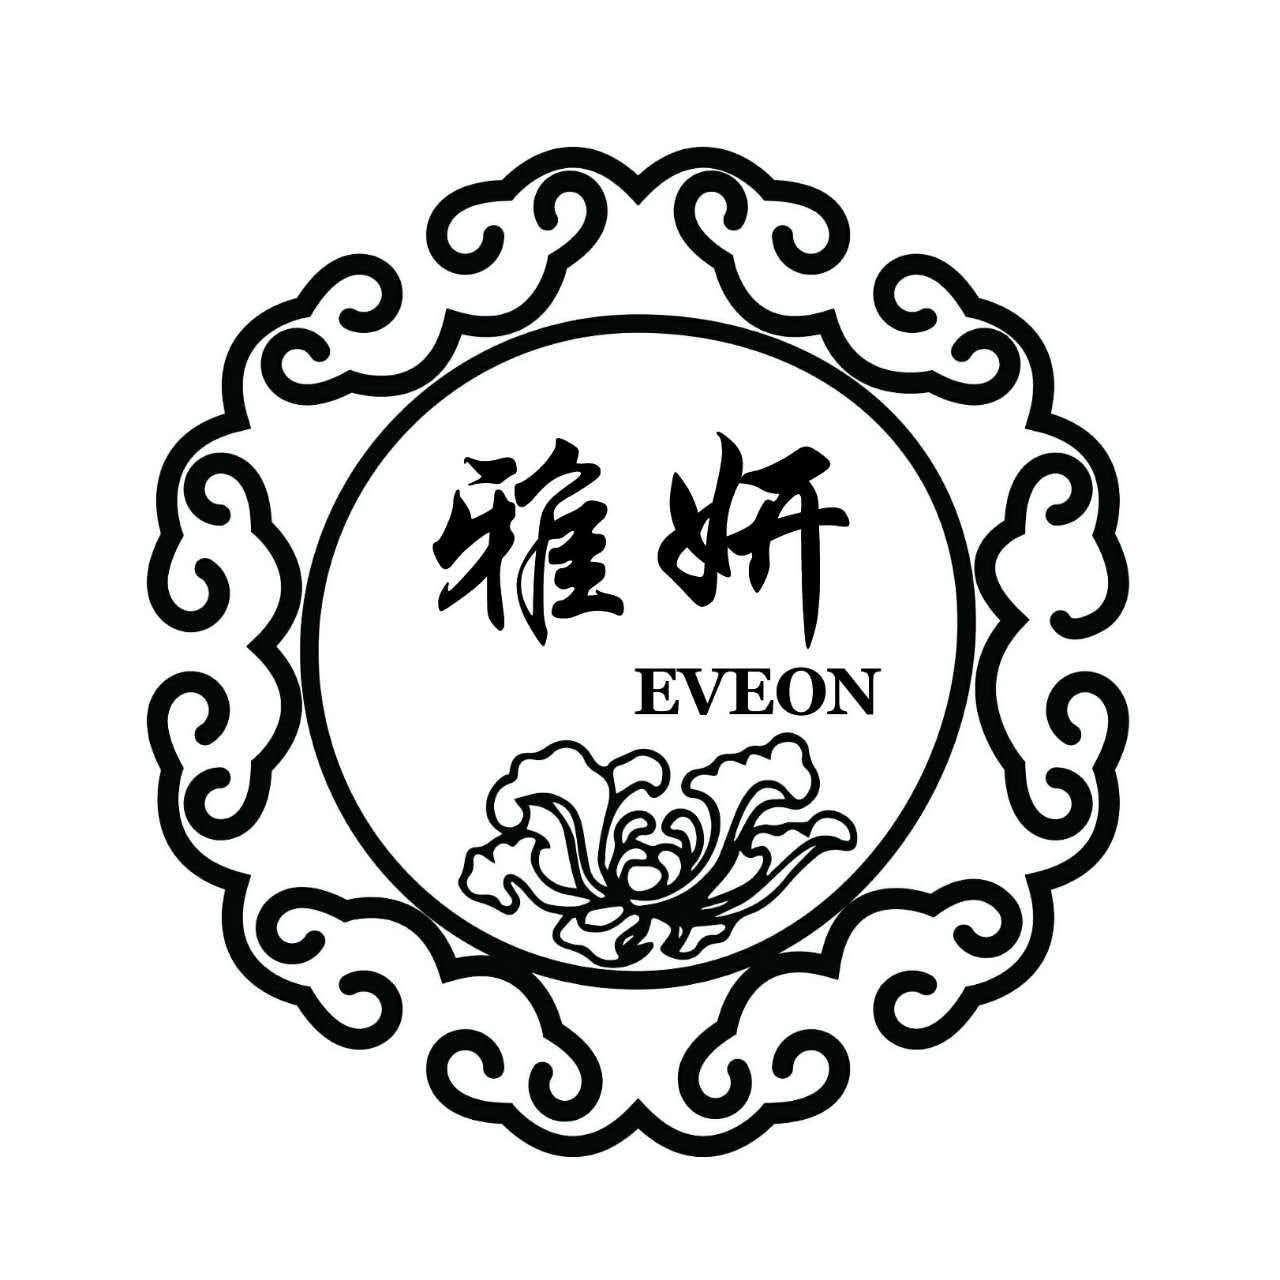 Eveon.  雅妍专业祛痘-美团